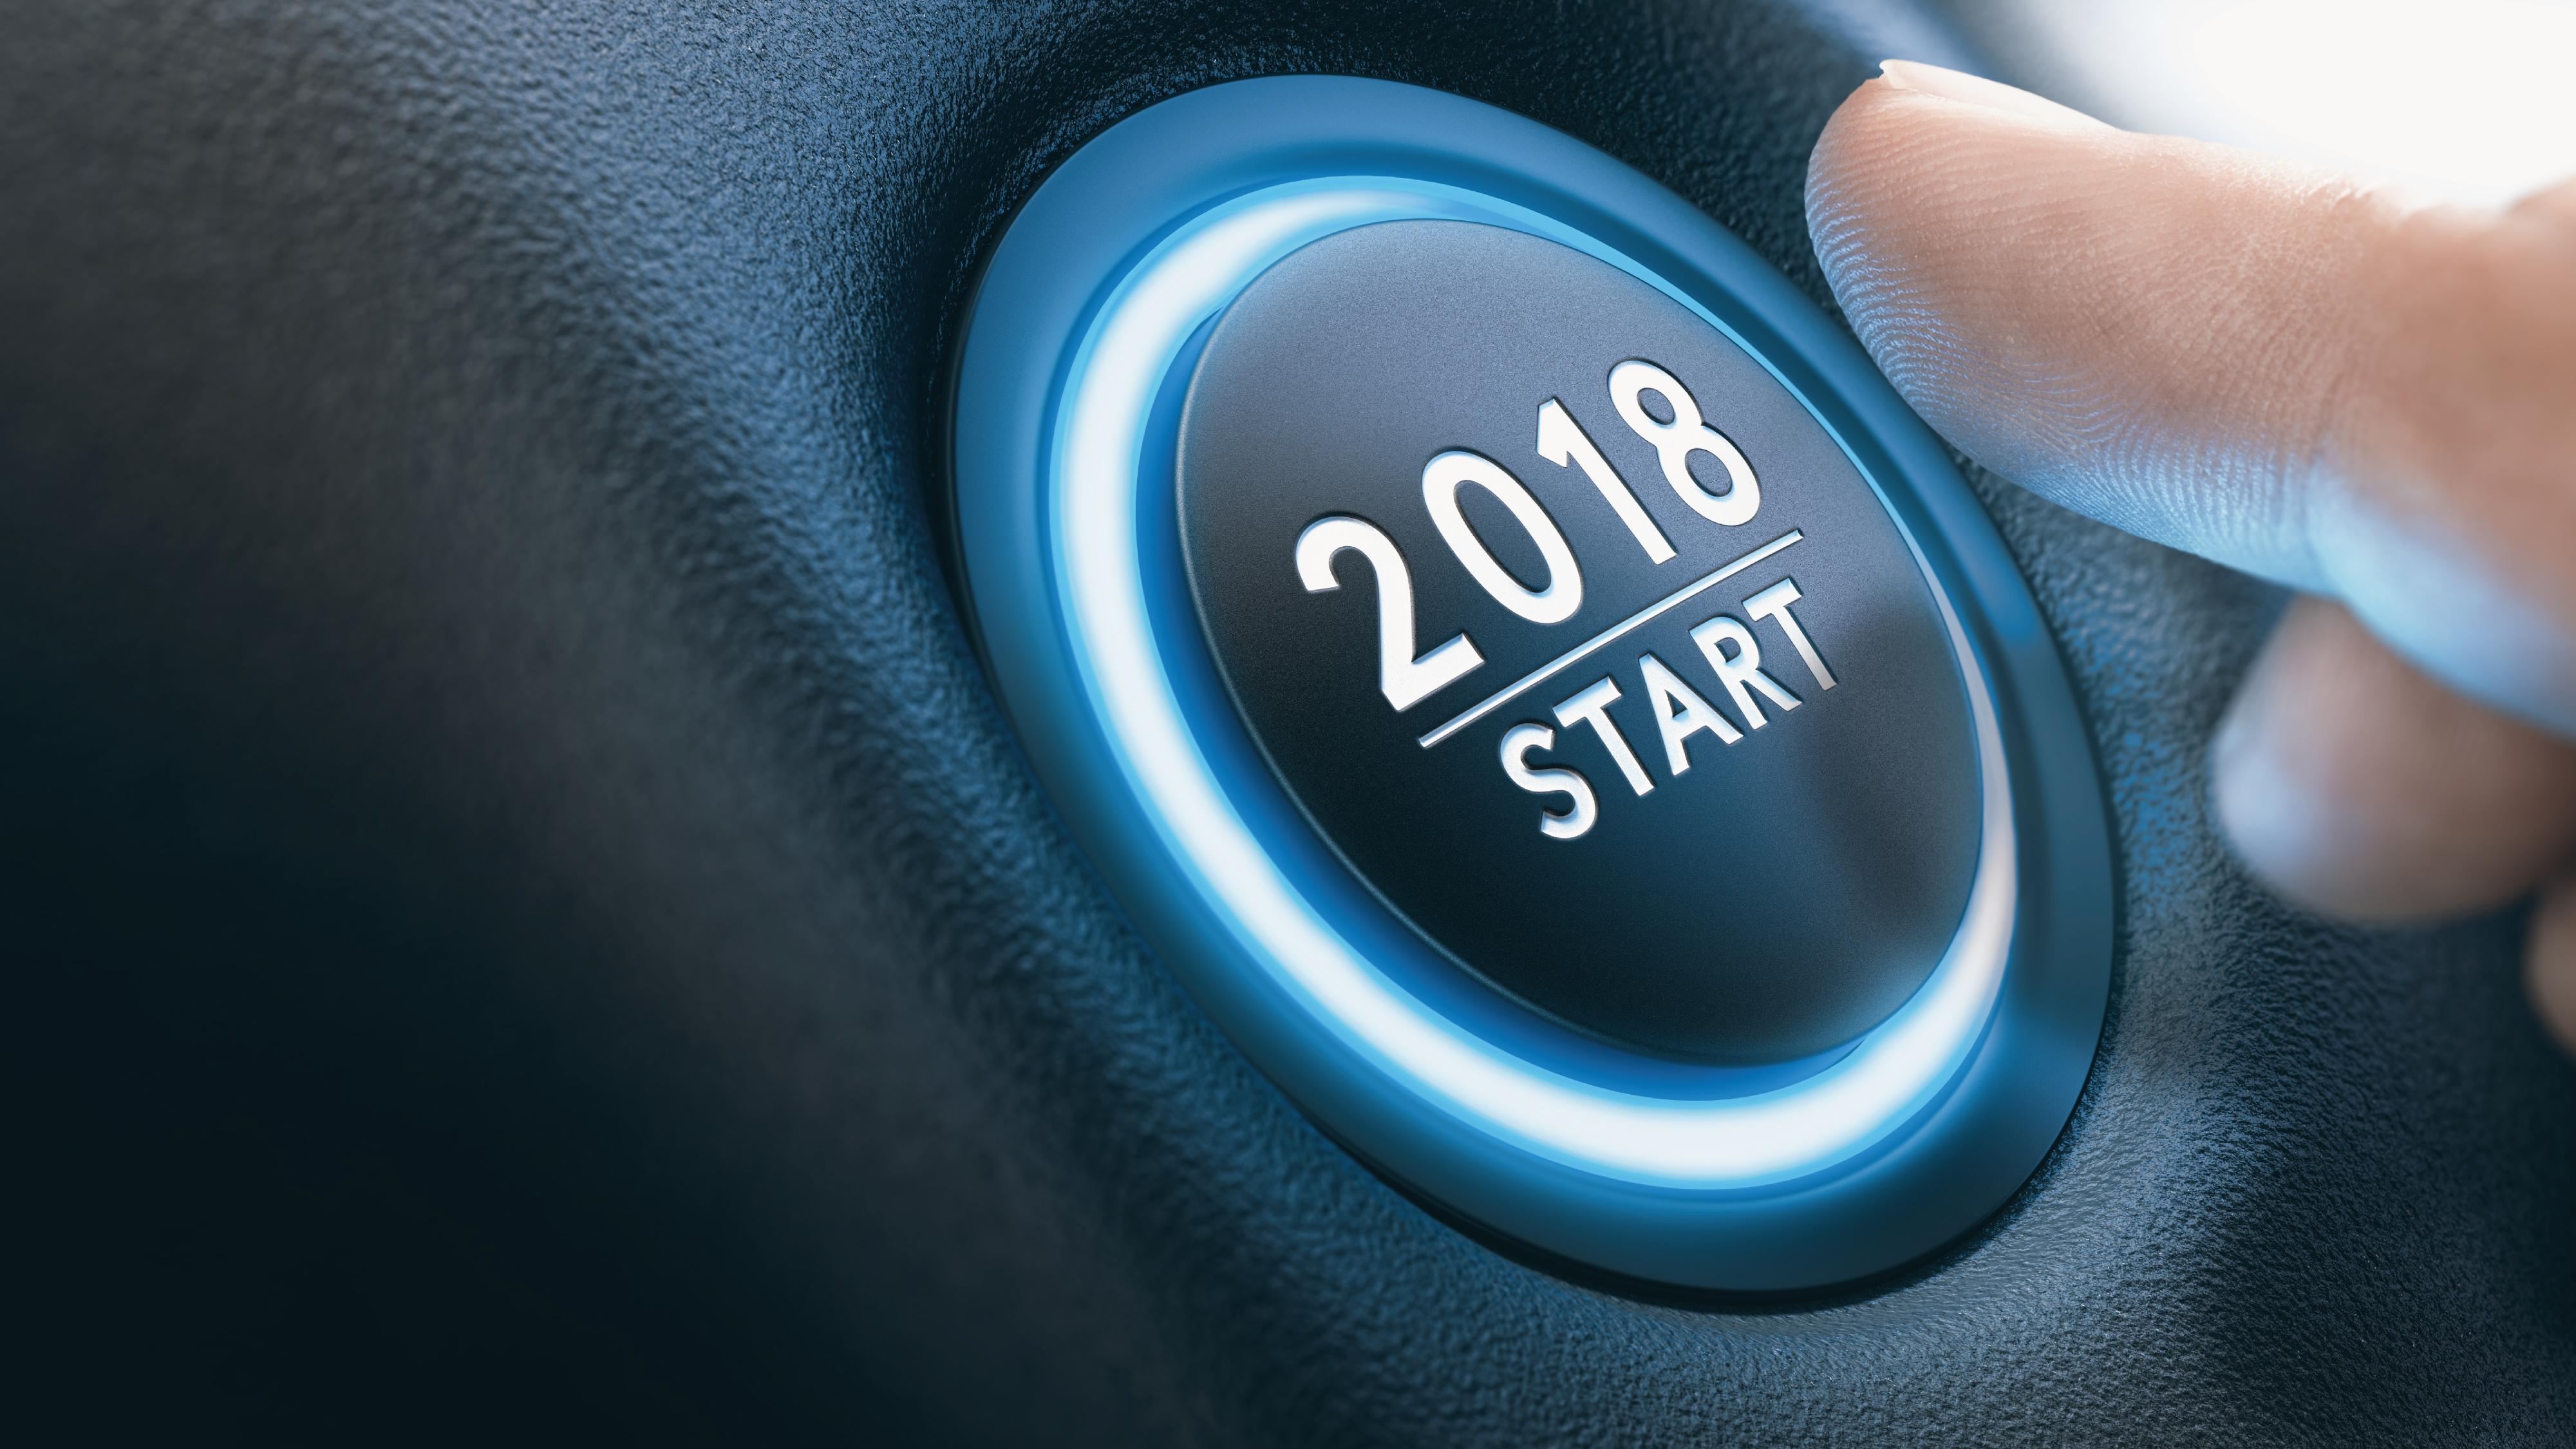 2018 Start Button